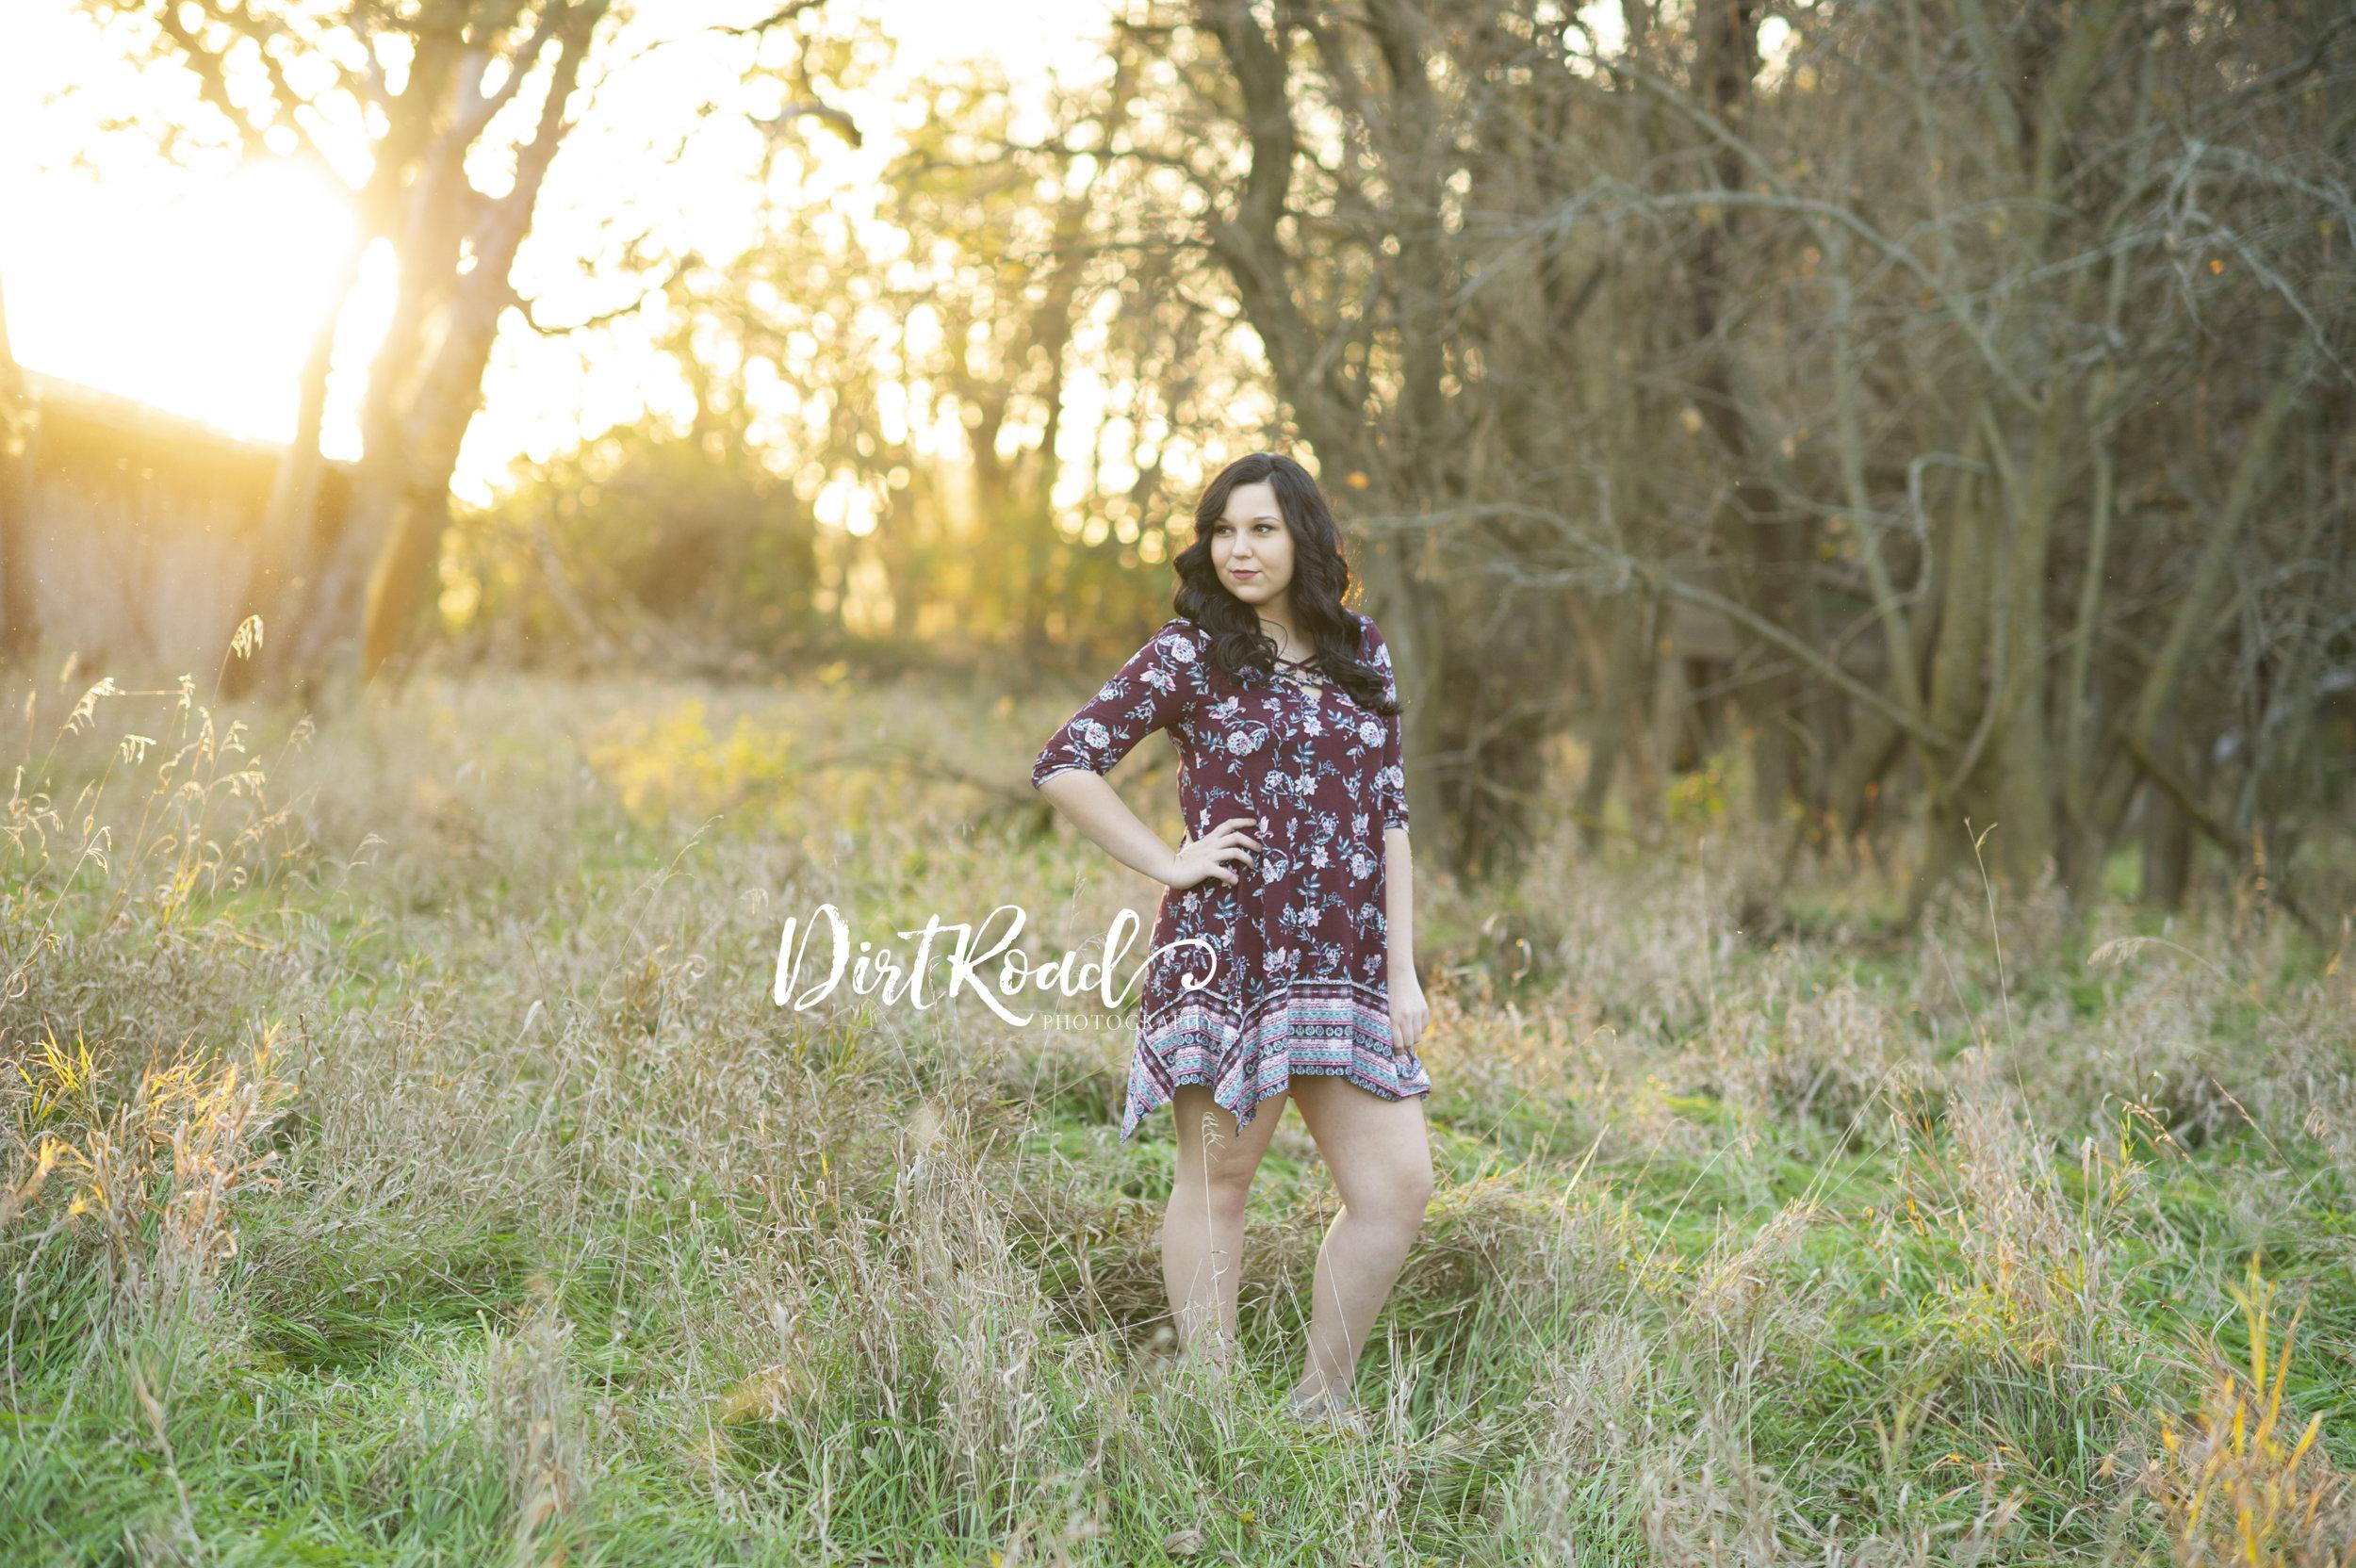 dirt-road-photography-kelsey-homolka-nerud-wilber-nebraska-southeast-photographer-senior-farm-grass-sunshine-sunflare-sunset-girl-senior-high-school-fairbury-high-southeast-nebraska-photgrapher-photography-green-grass-wood-fence-glasses-brown-hair-maroon-dress-destiny-brown